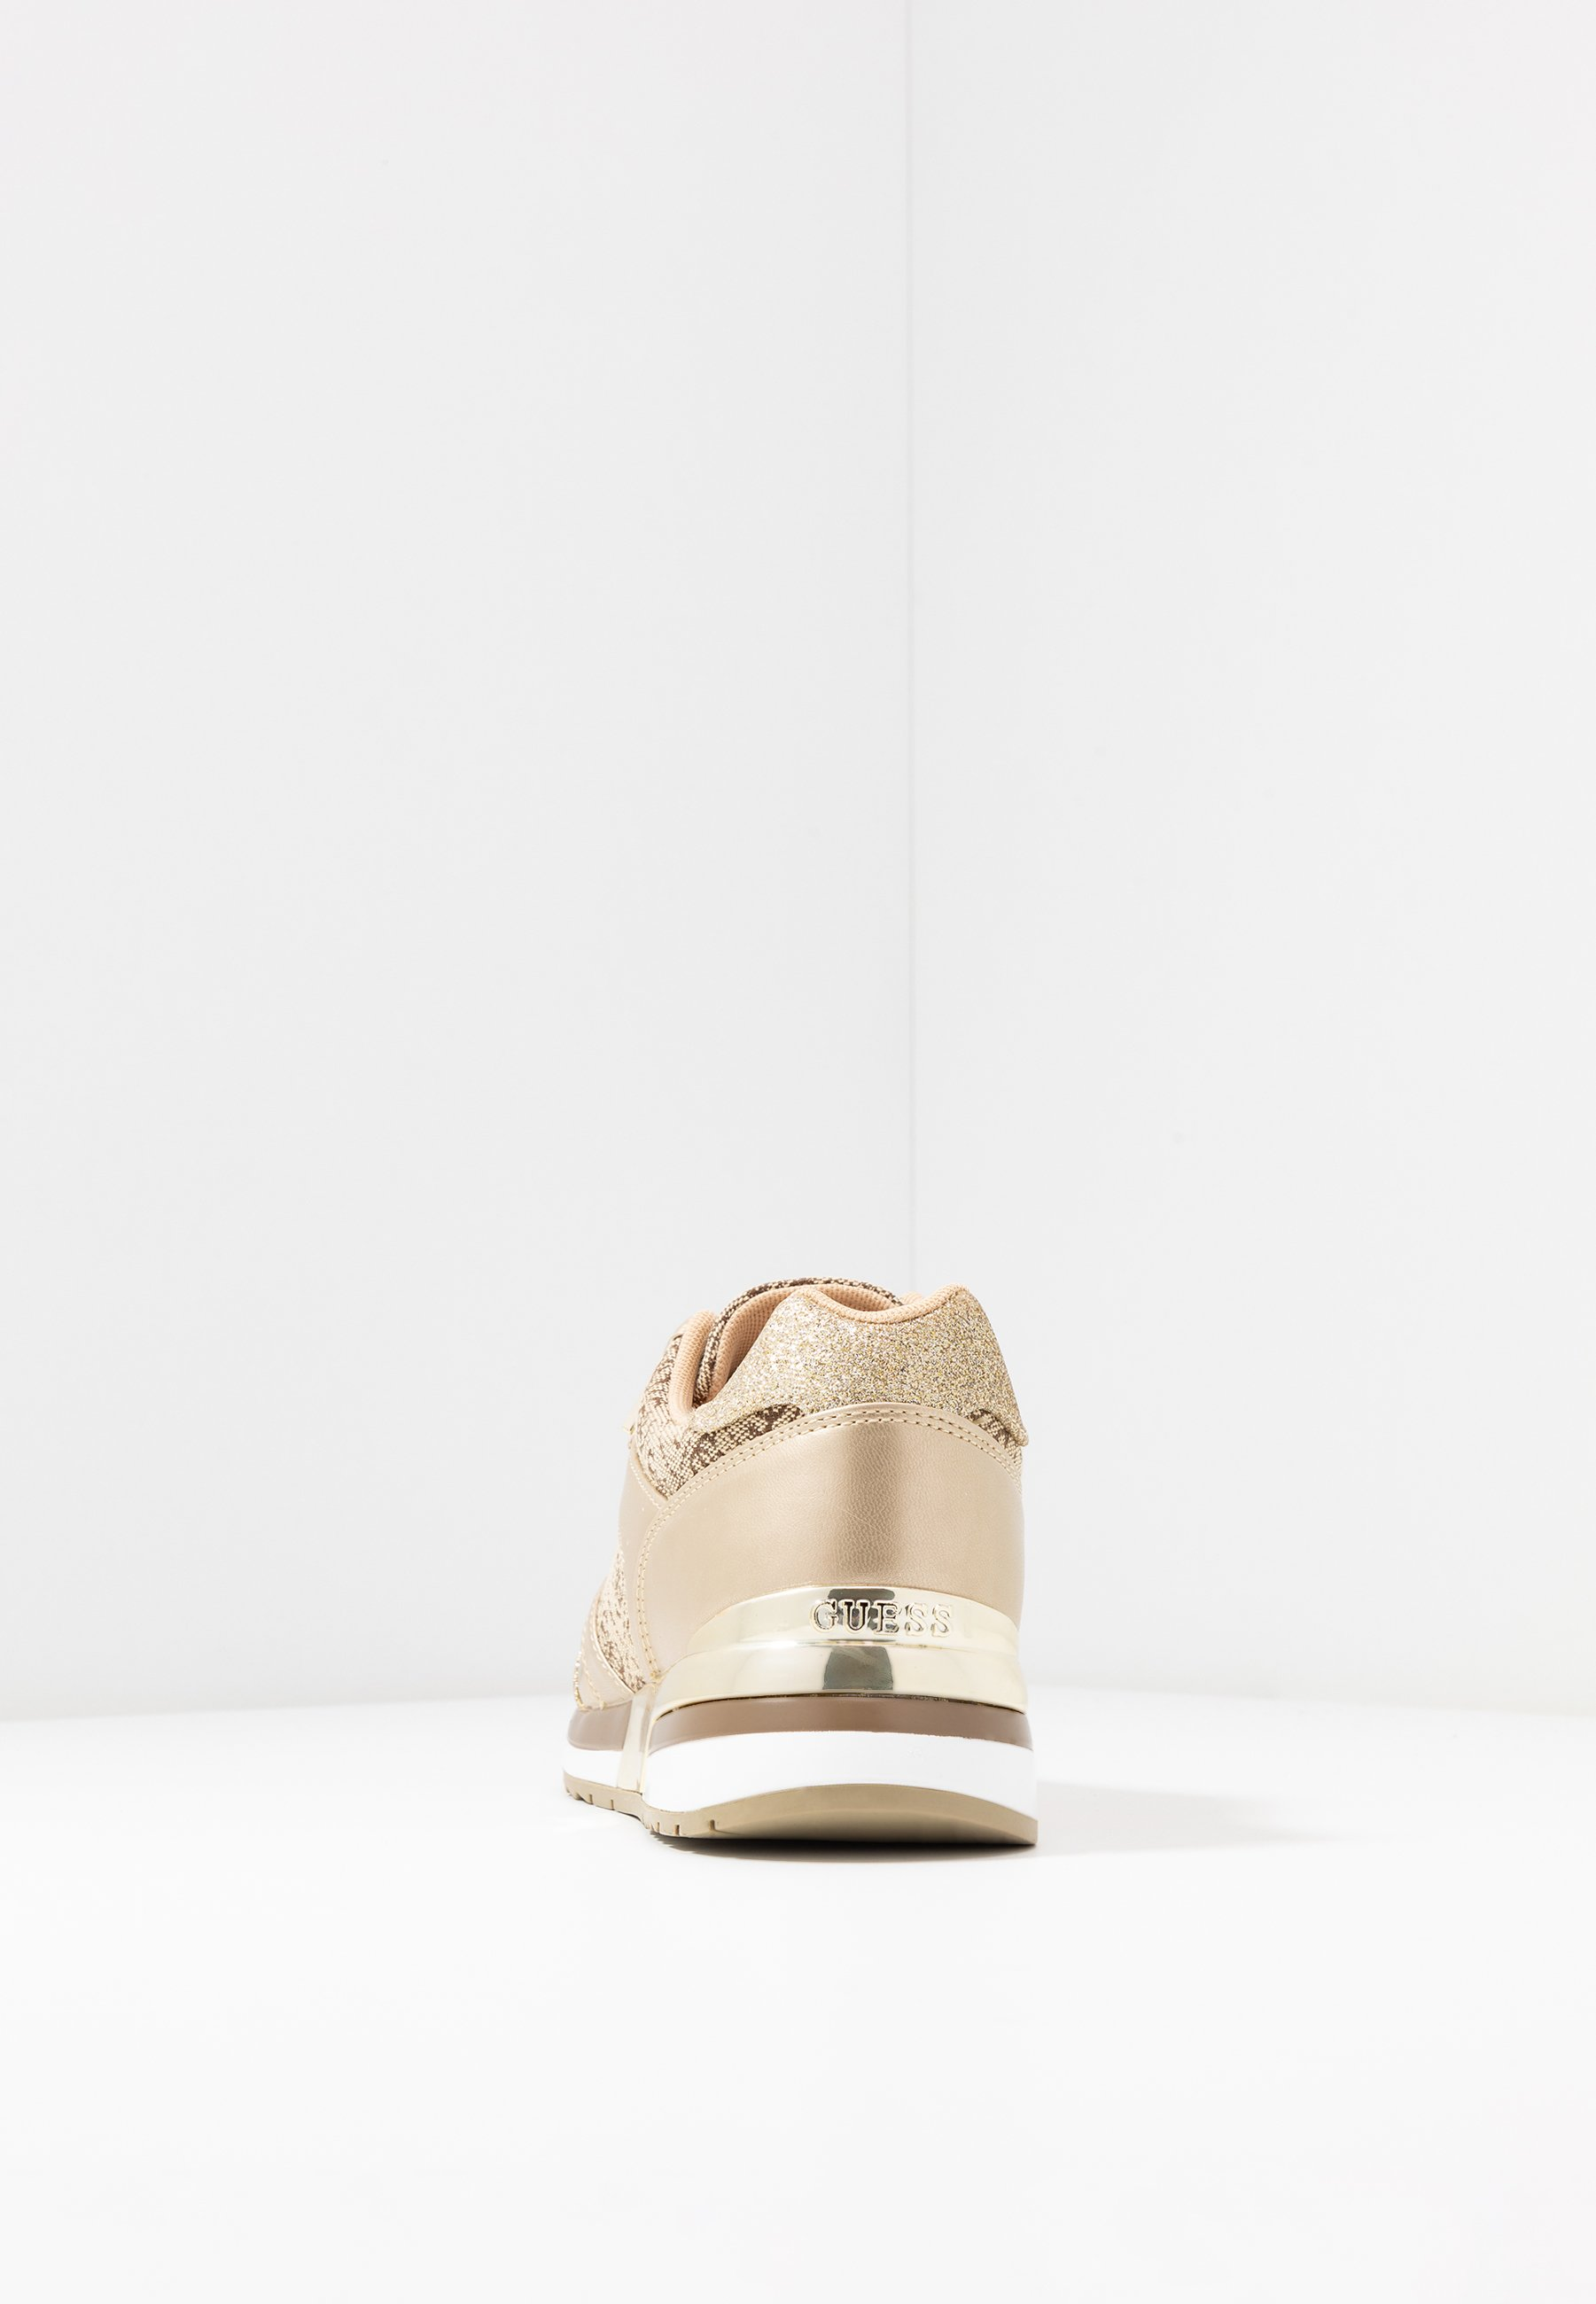 Guess Motiv - Joggesko Beige/light Brown/beige